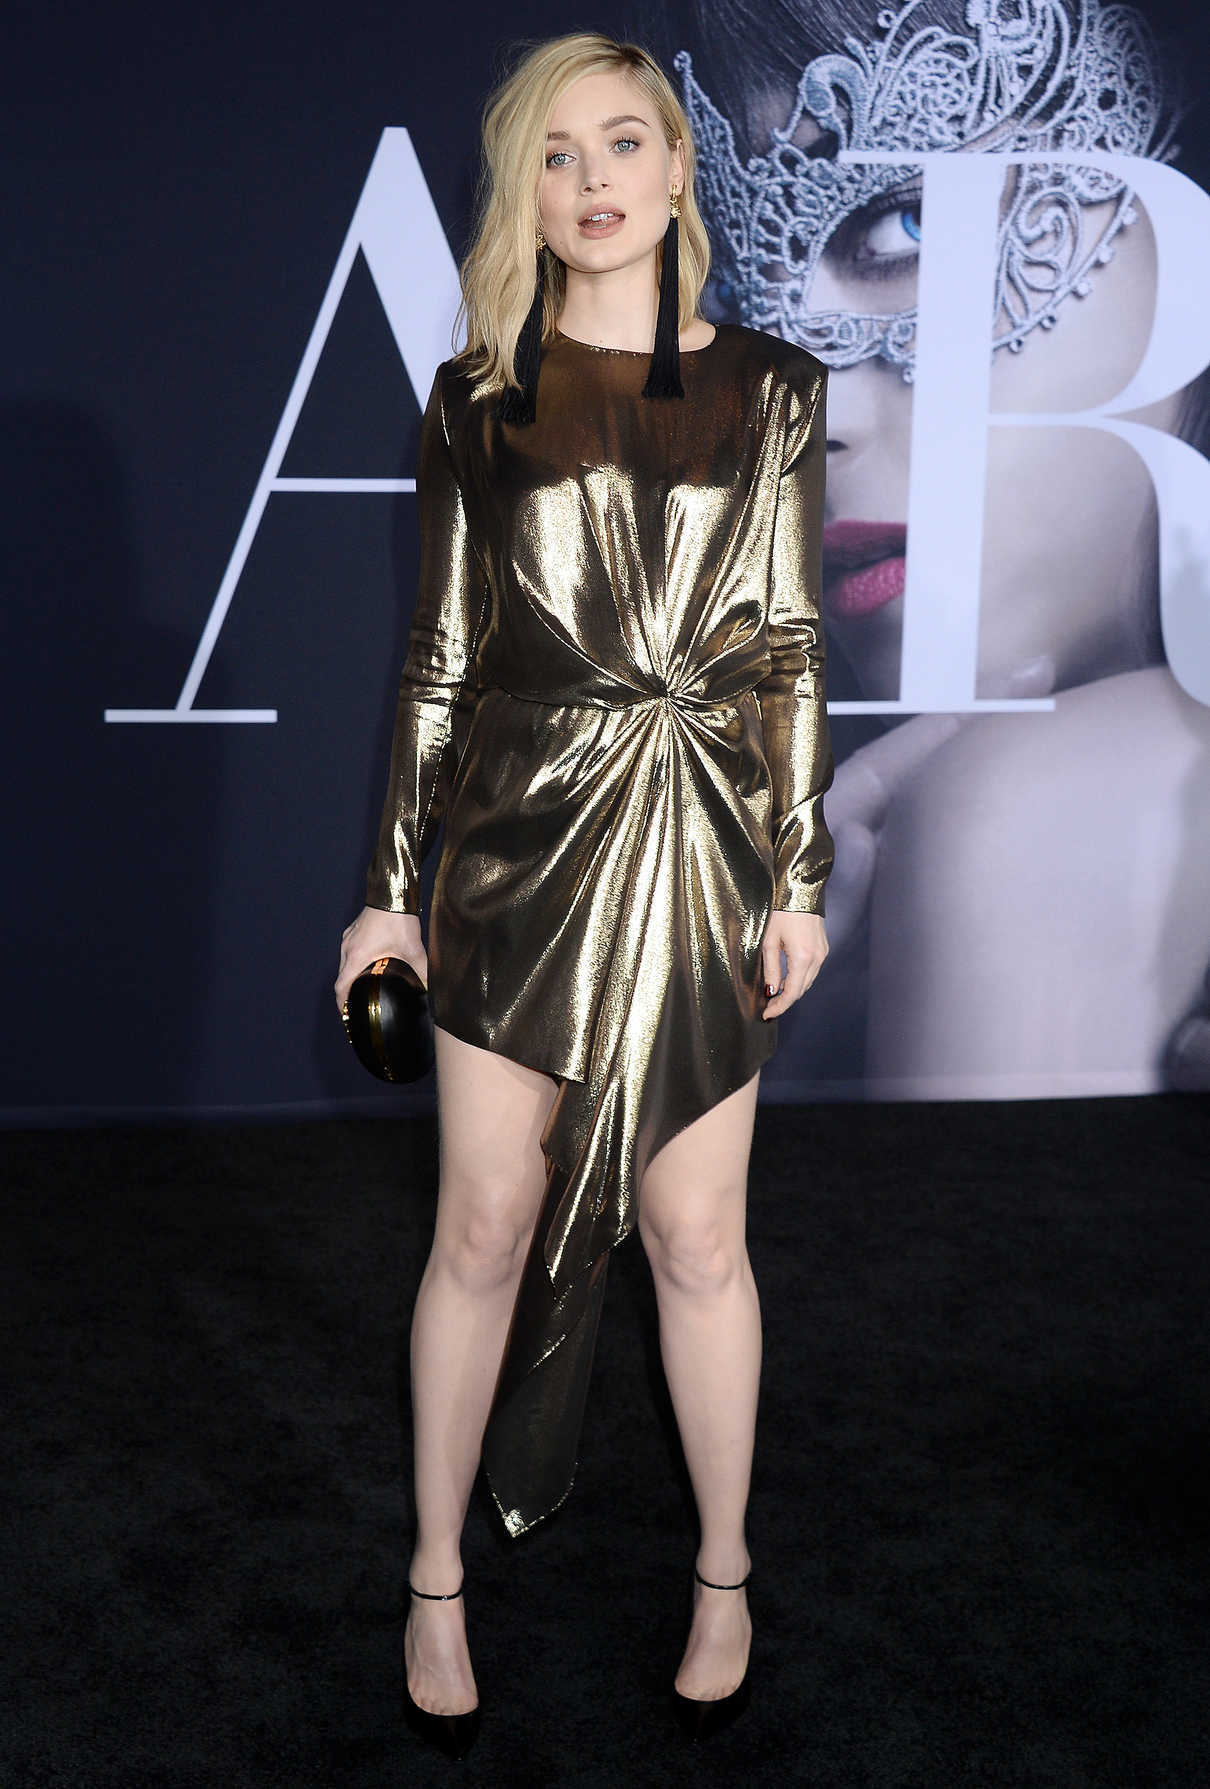 Skylar grey american music awards 2019 in los angeles,Vanessa mai braless Porno image Jennifer Lawrence No Bra Nipple Pic,Danni levy ass